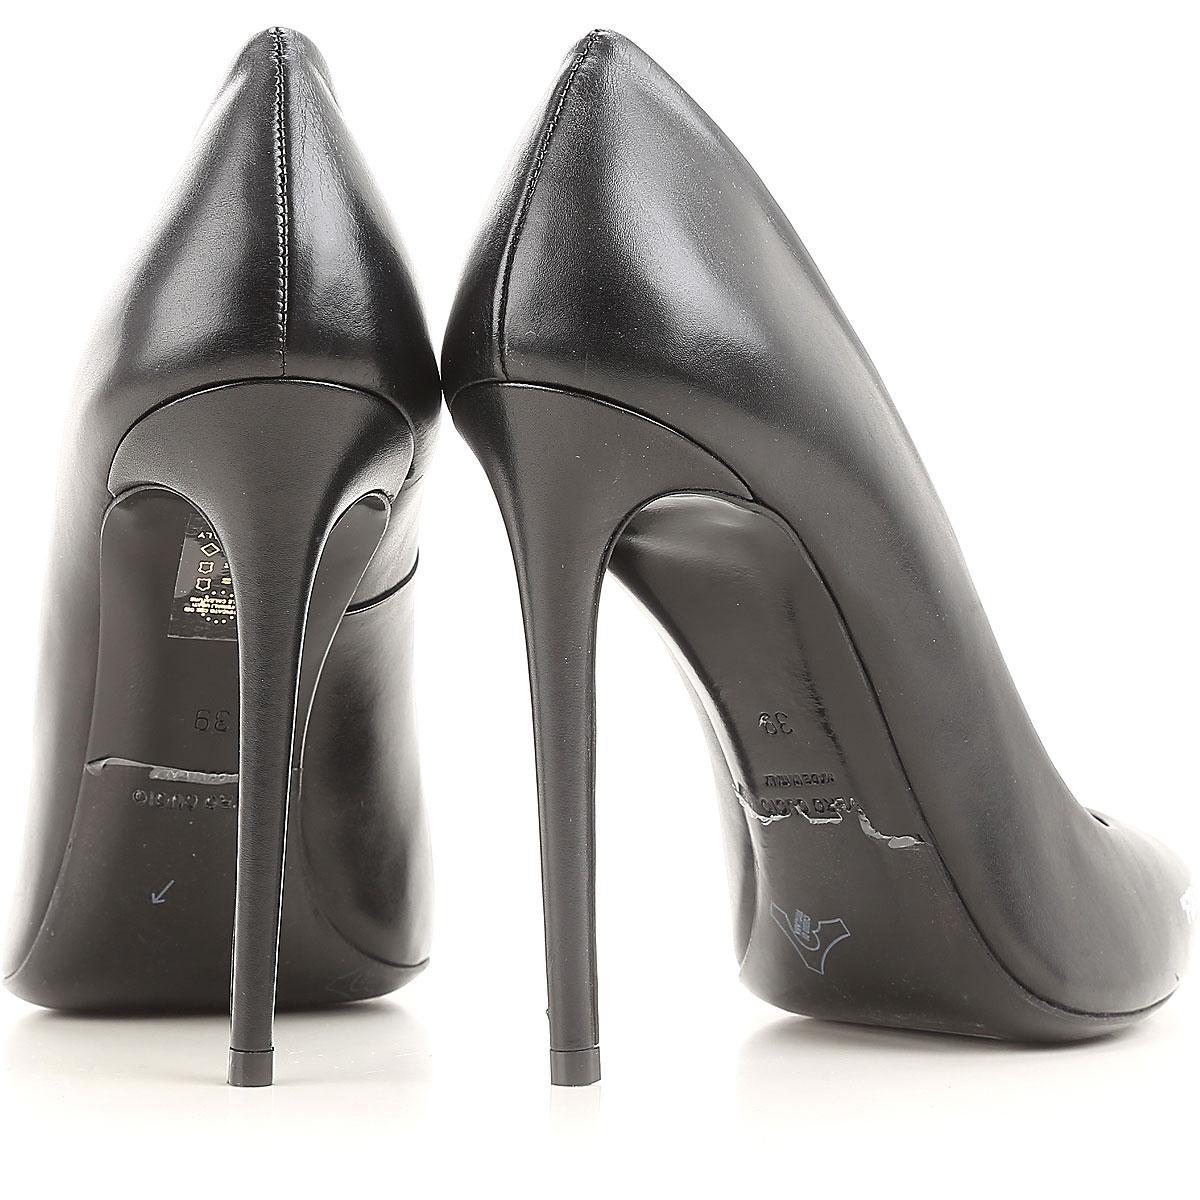 83d0eab1c11 Off-White c o Virgil Abloh - Black Pumps   High Heels For Women. View  fullscreen